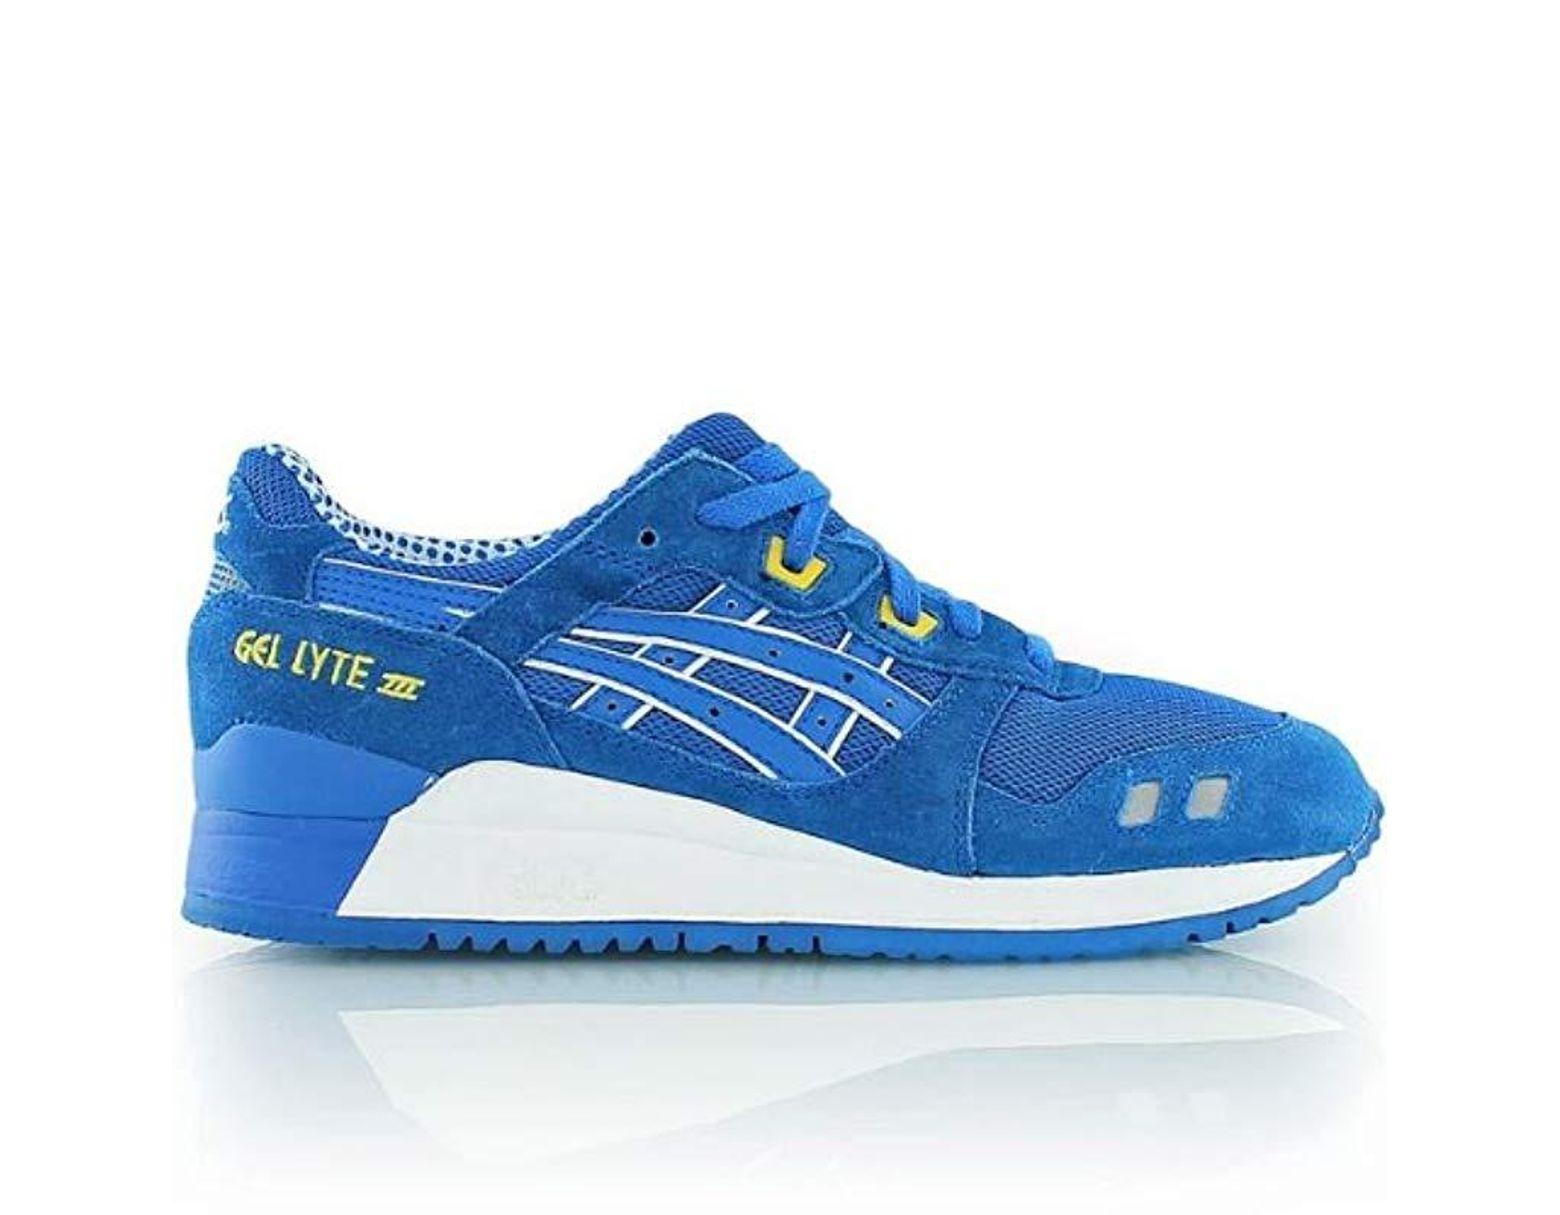 Asics Gel Lyte Iii Shoes Mid Blue Cmyk in Blue for Men Lyst